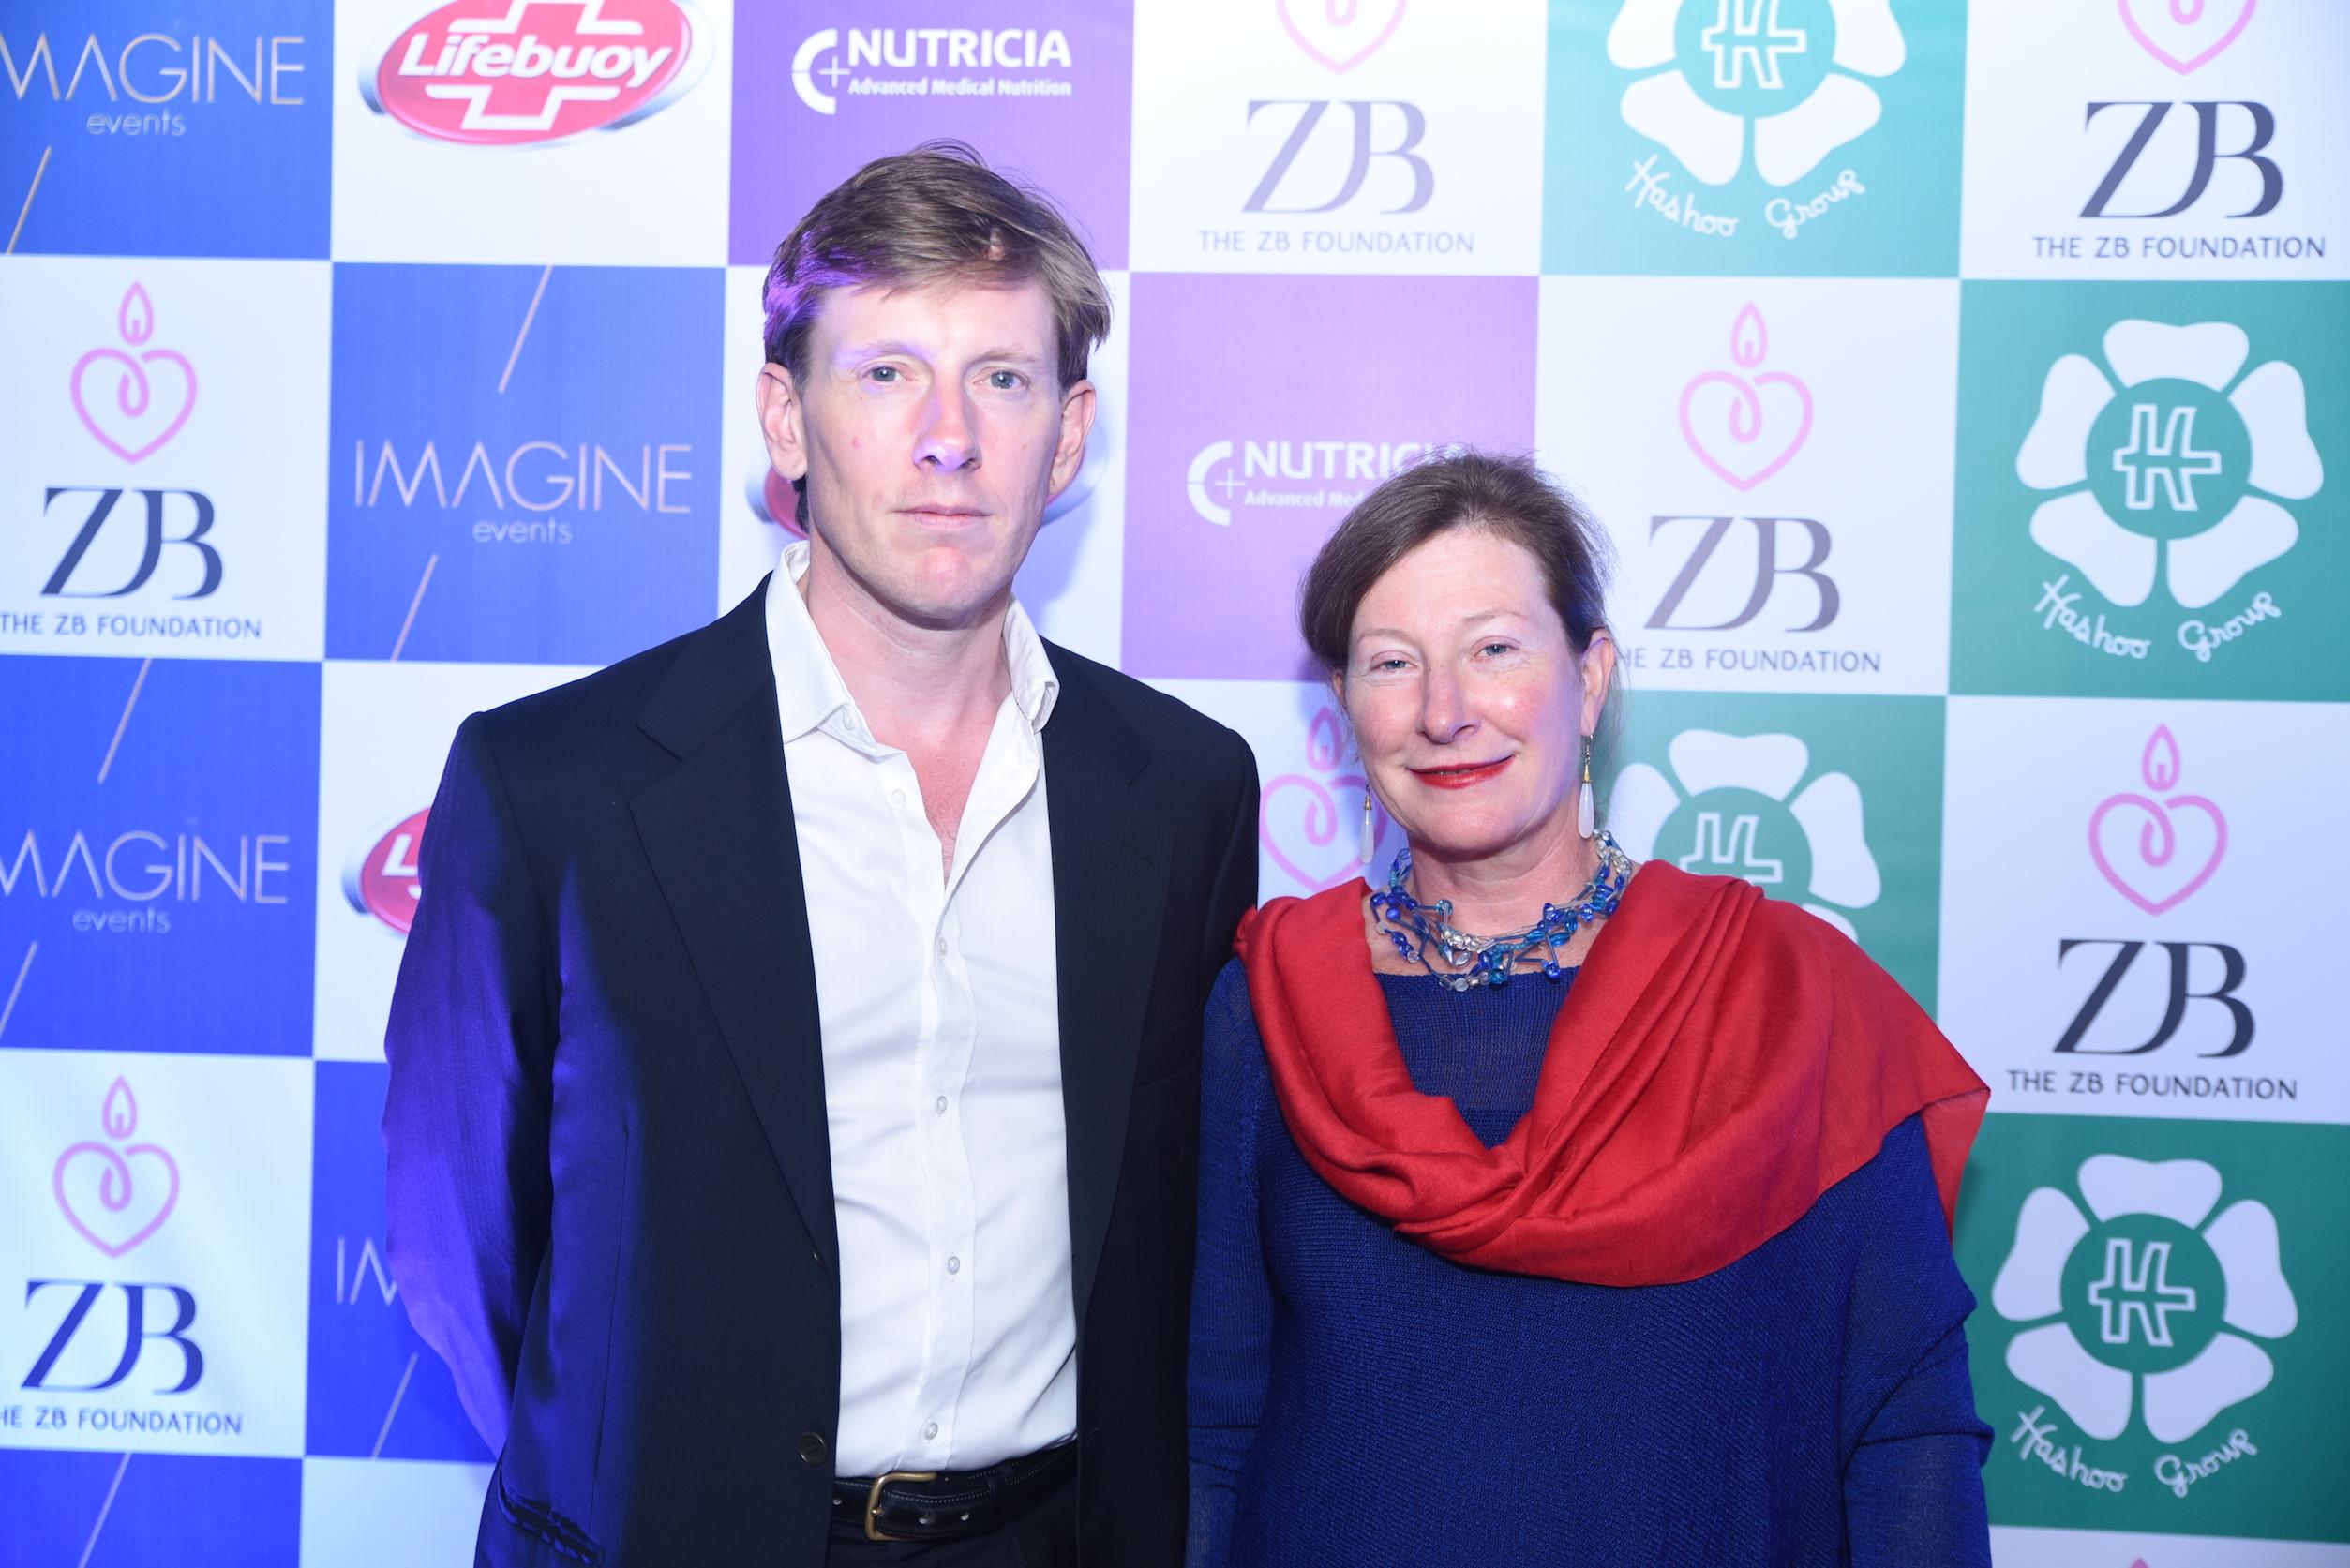 Richard Crowder Deputy British High Commissioner to Pakistan